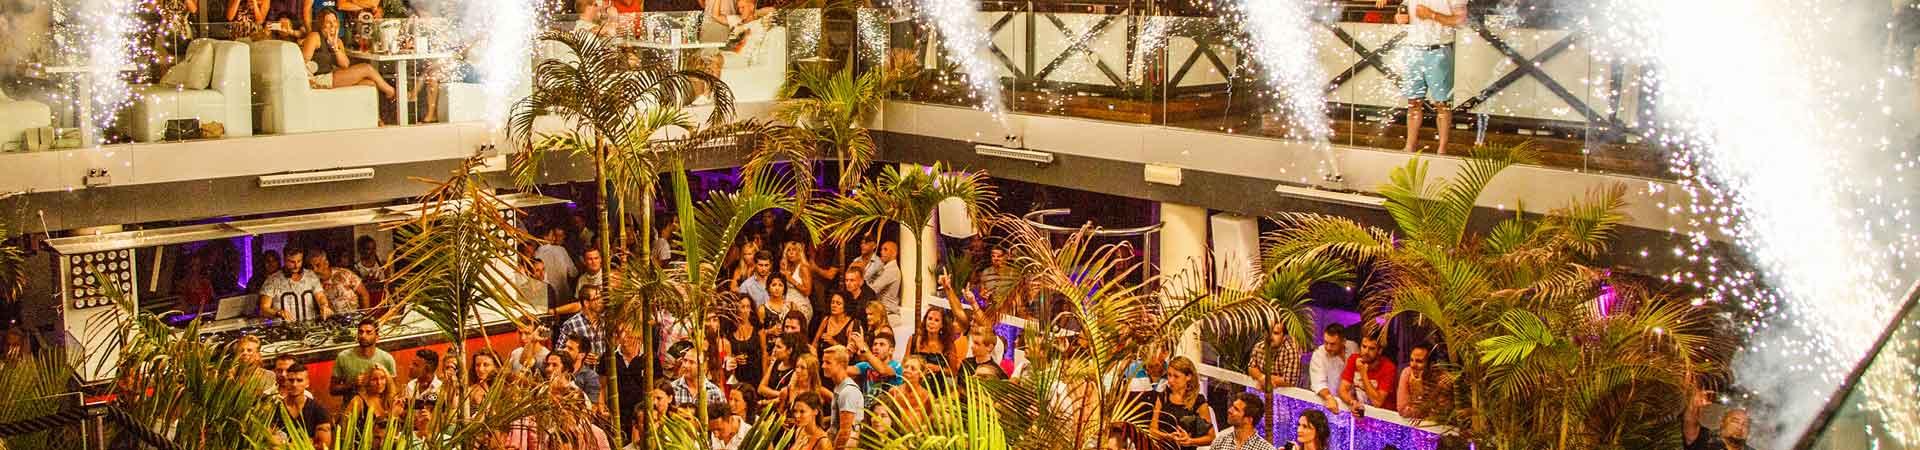 https://www.goodmorningtenerife.com/wp-content/uploads/2015/07/02_slide_papagayo-beach-club-1920x450-1.jpg